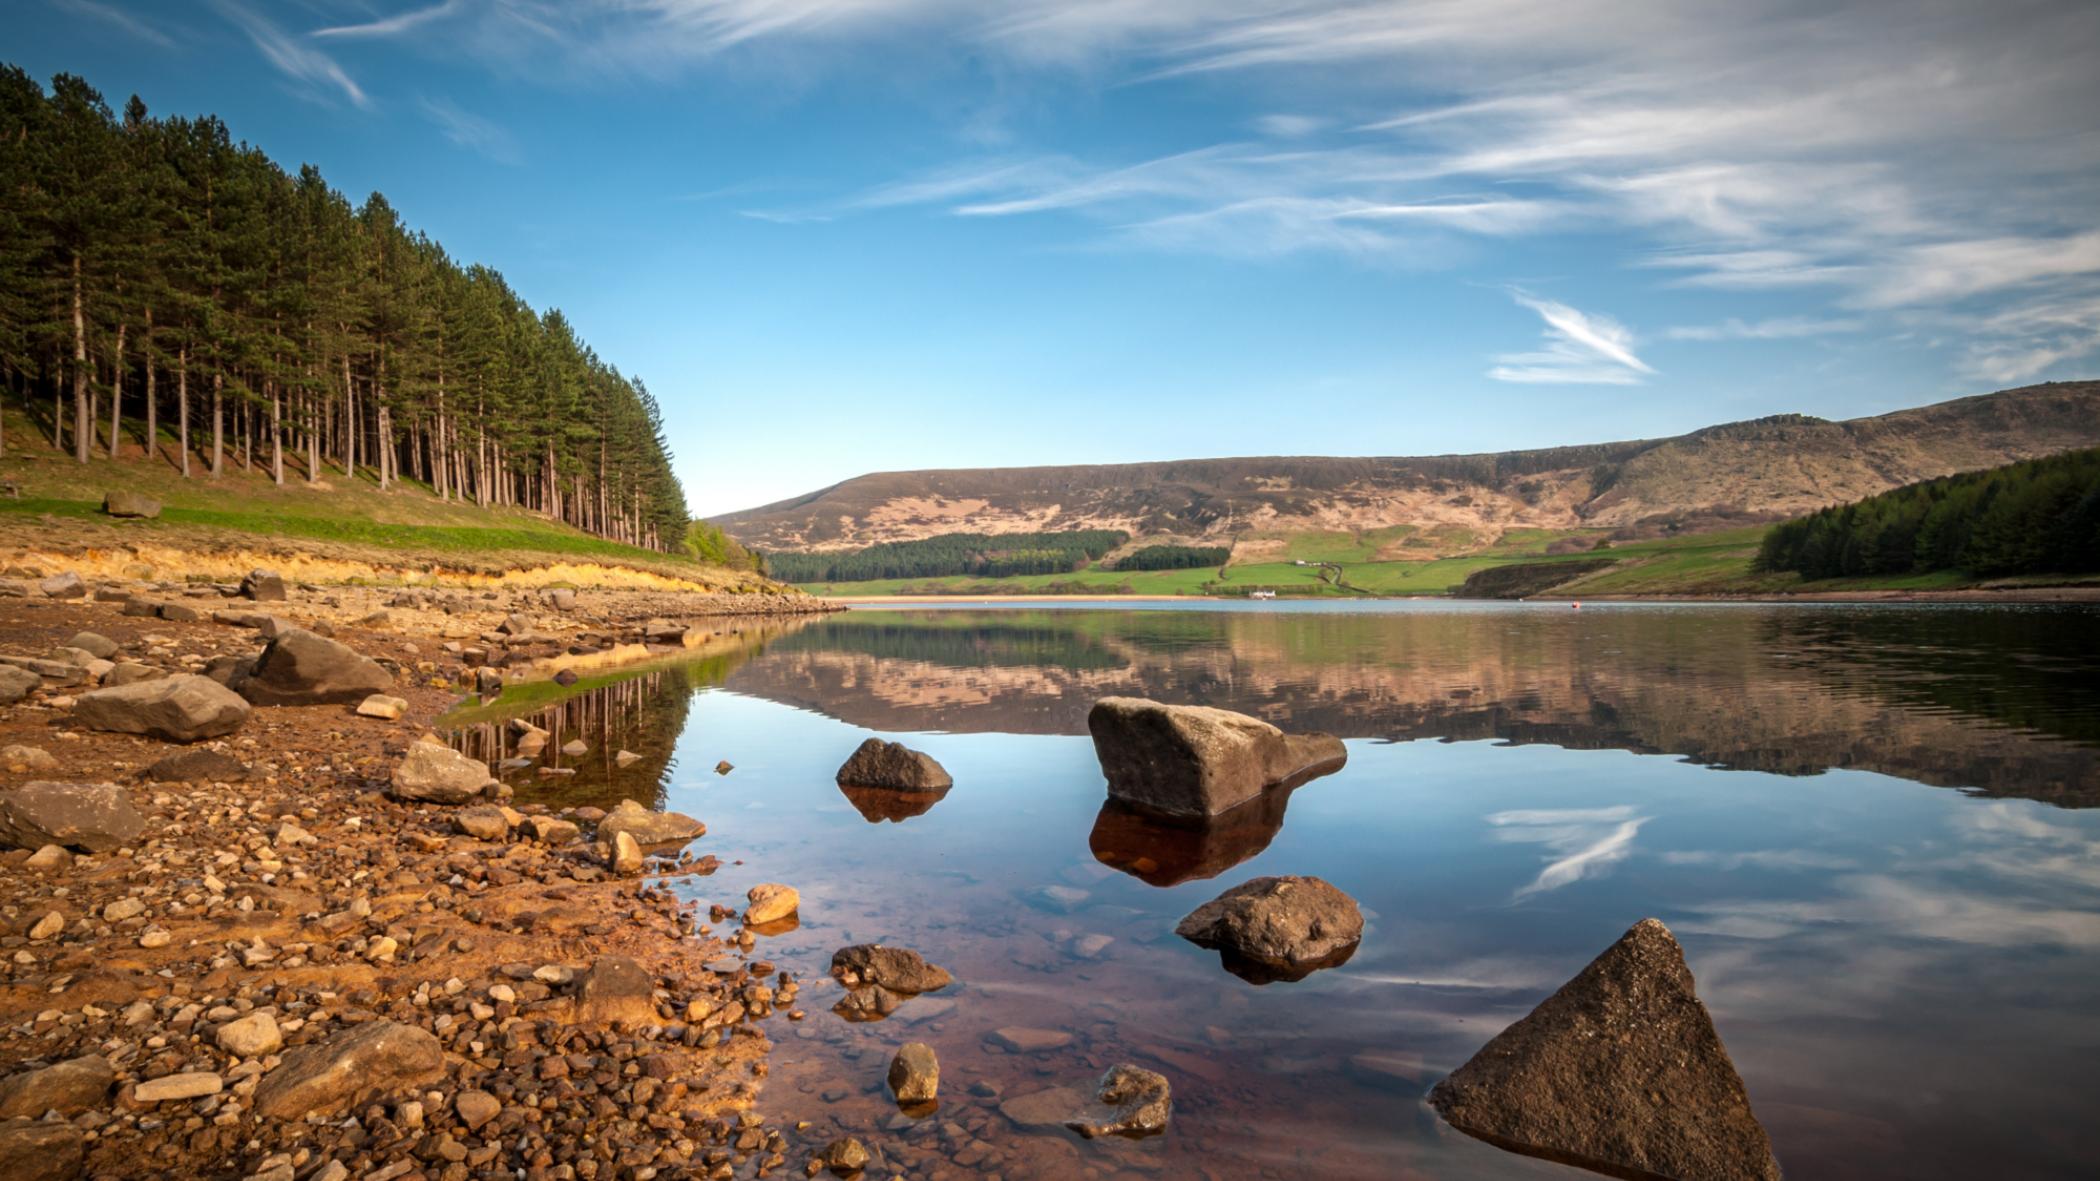 River landscape in North West England